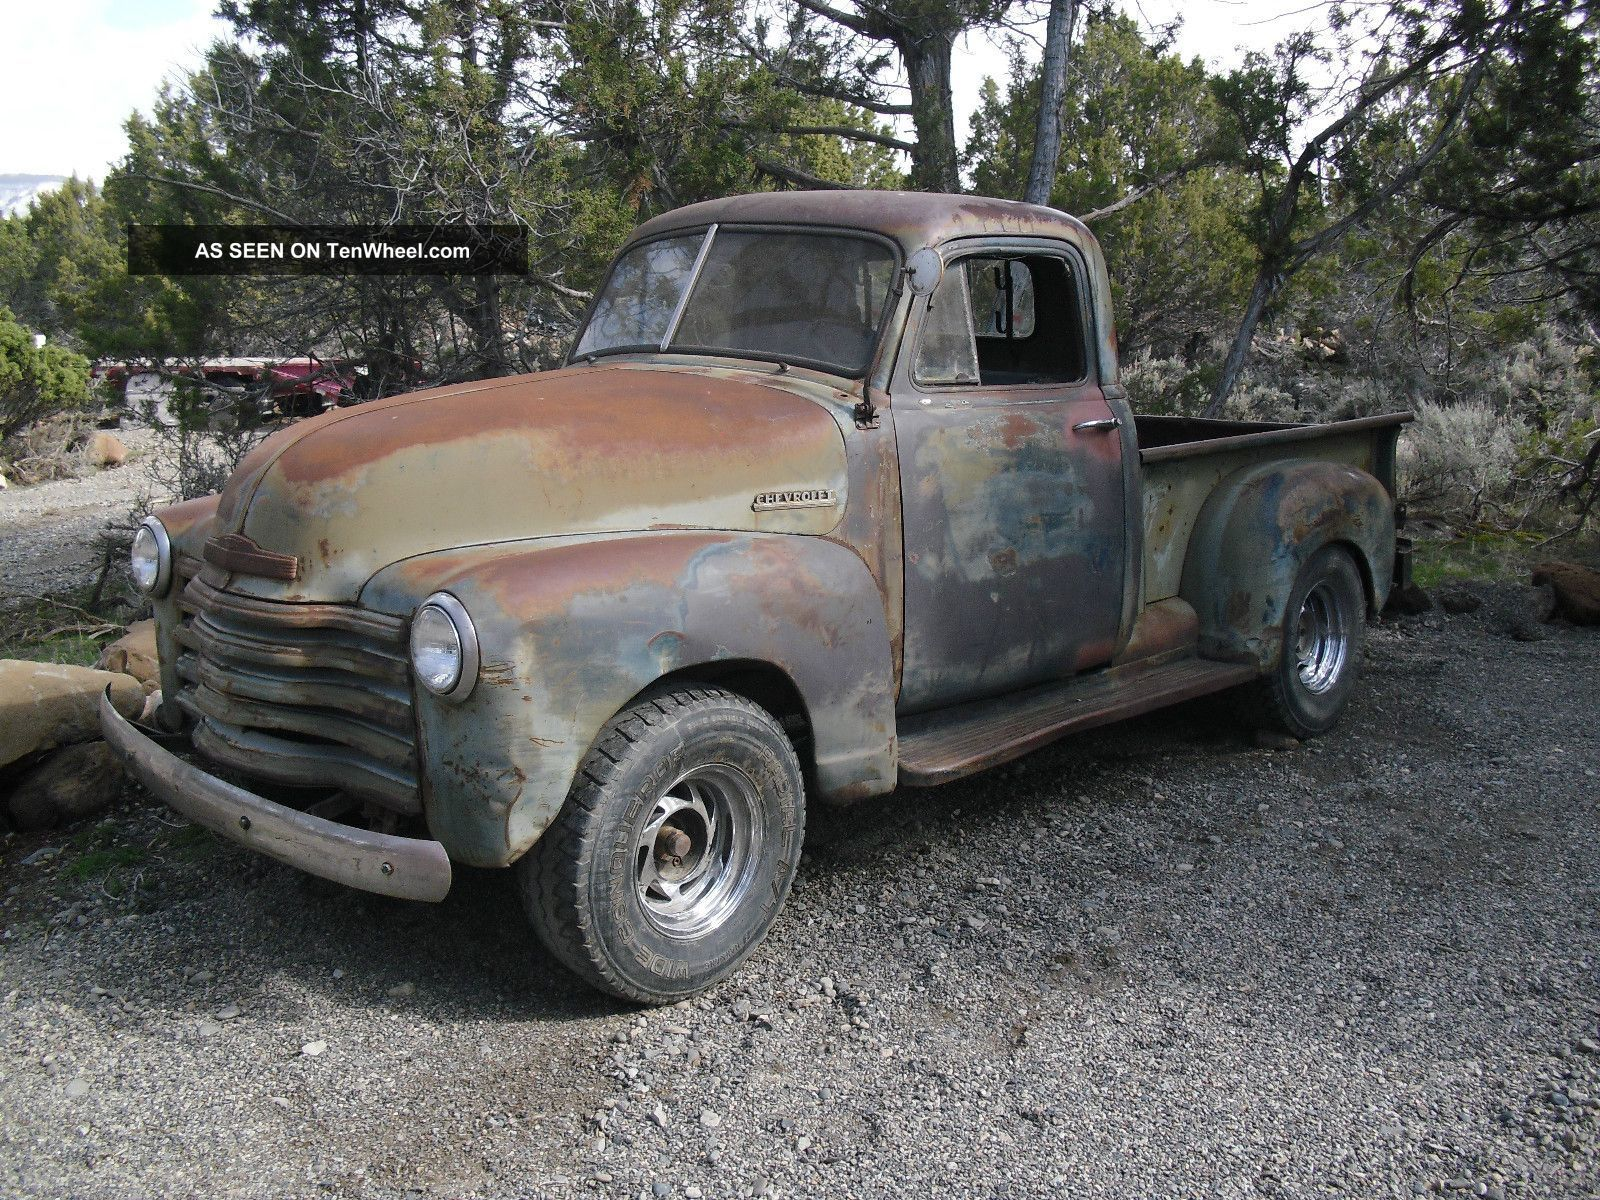 Chevrolet 1 Ton Truck | 1950 Chevy 1 / 2 Ton Truck Rat Rod Patina ...